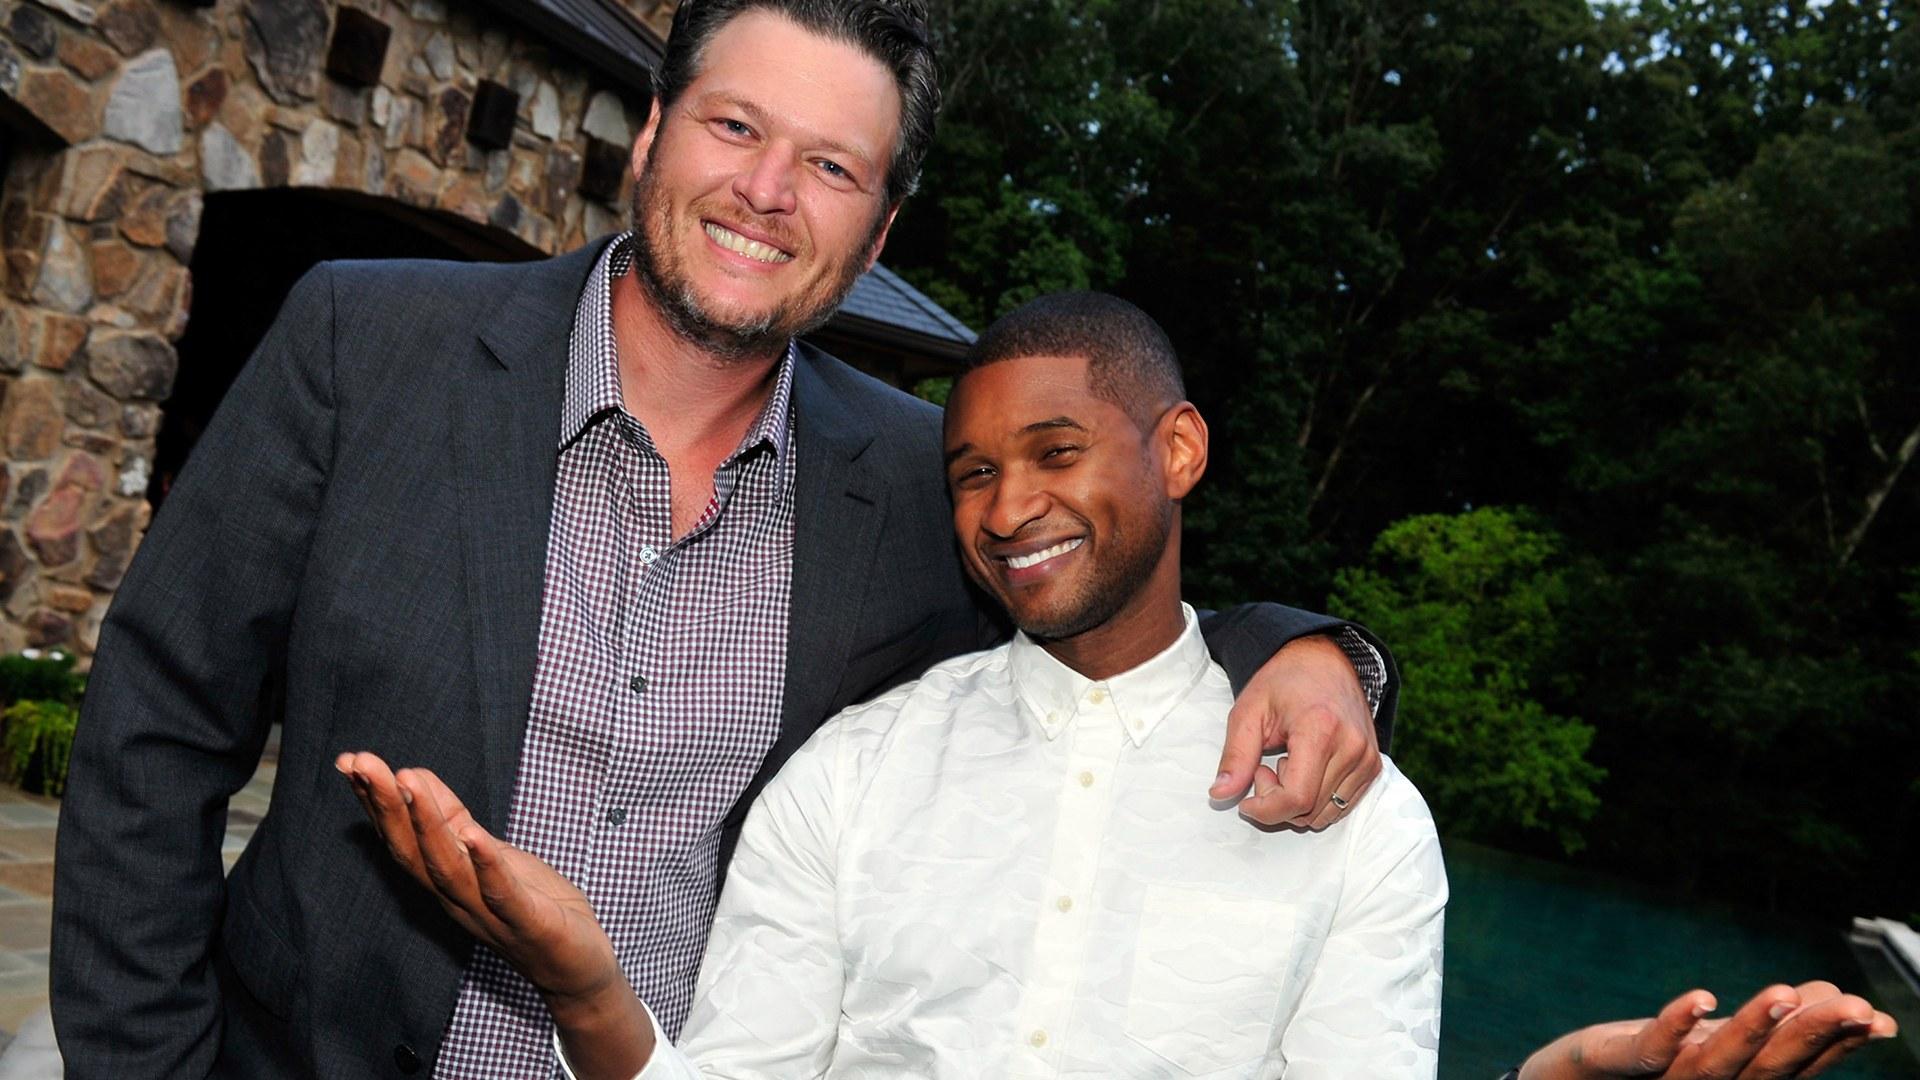 Image: BESTPIX - Usher Kicks Off 15th Anniversary Celebration Of Usher's New Look